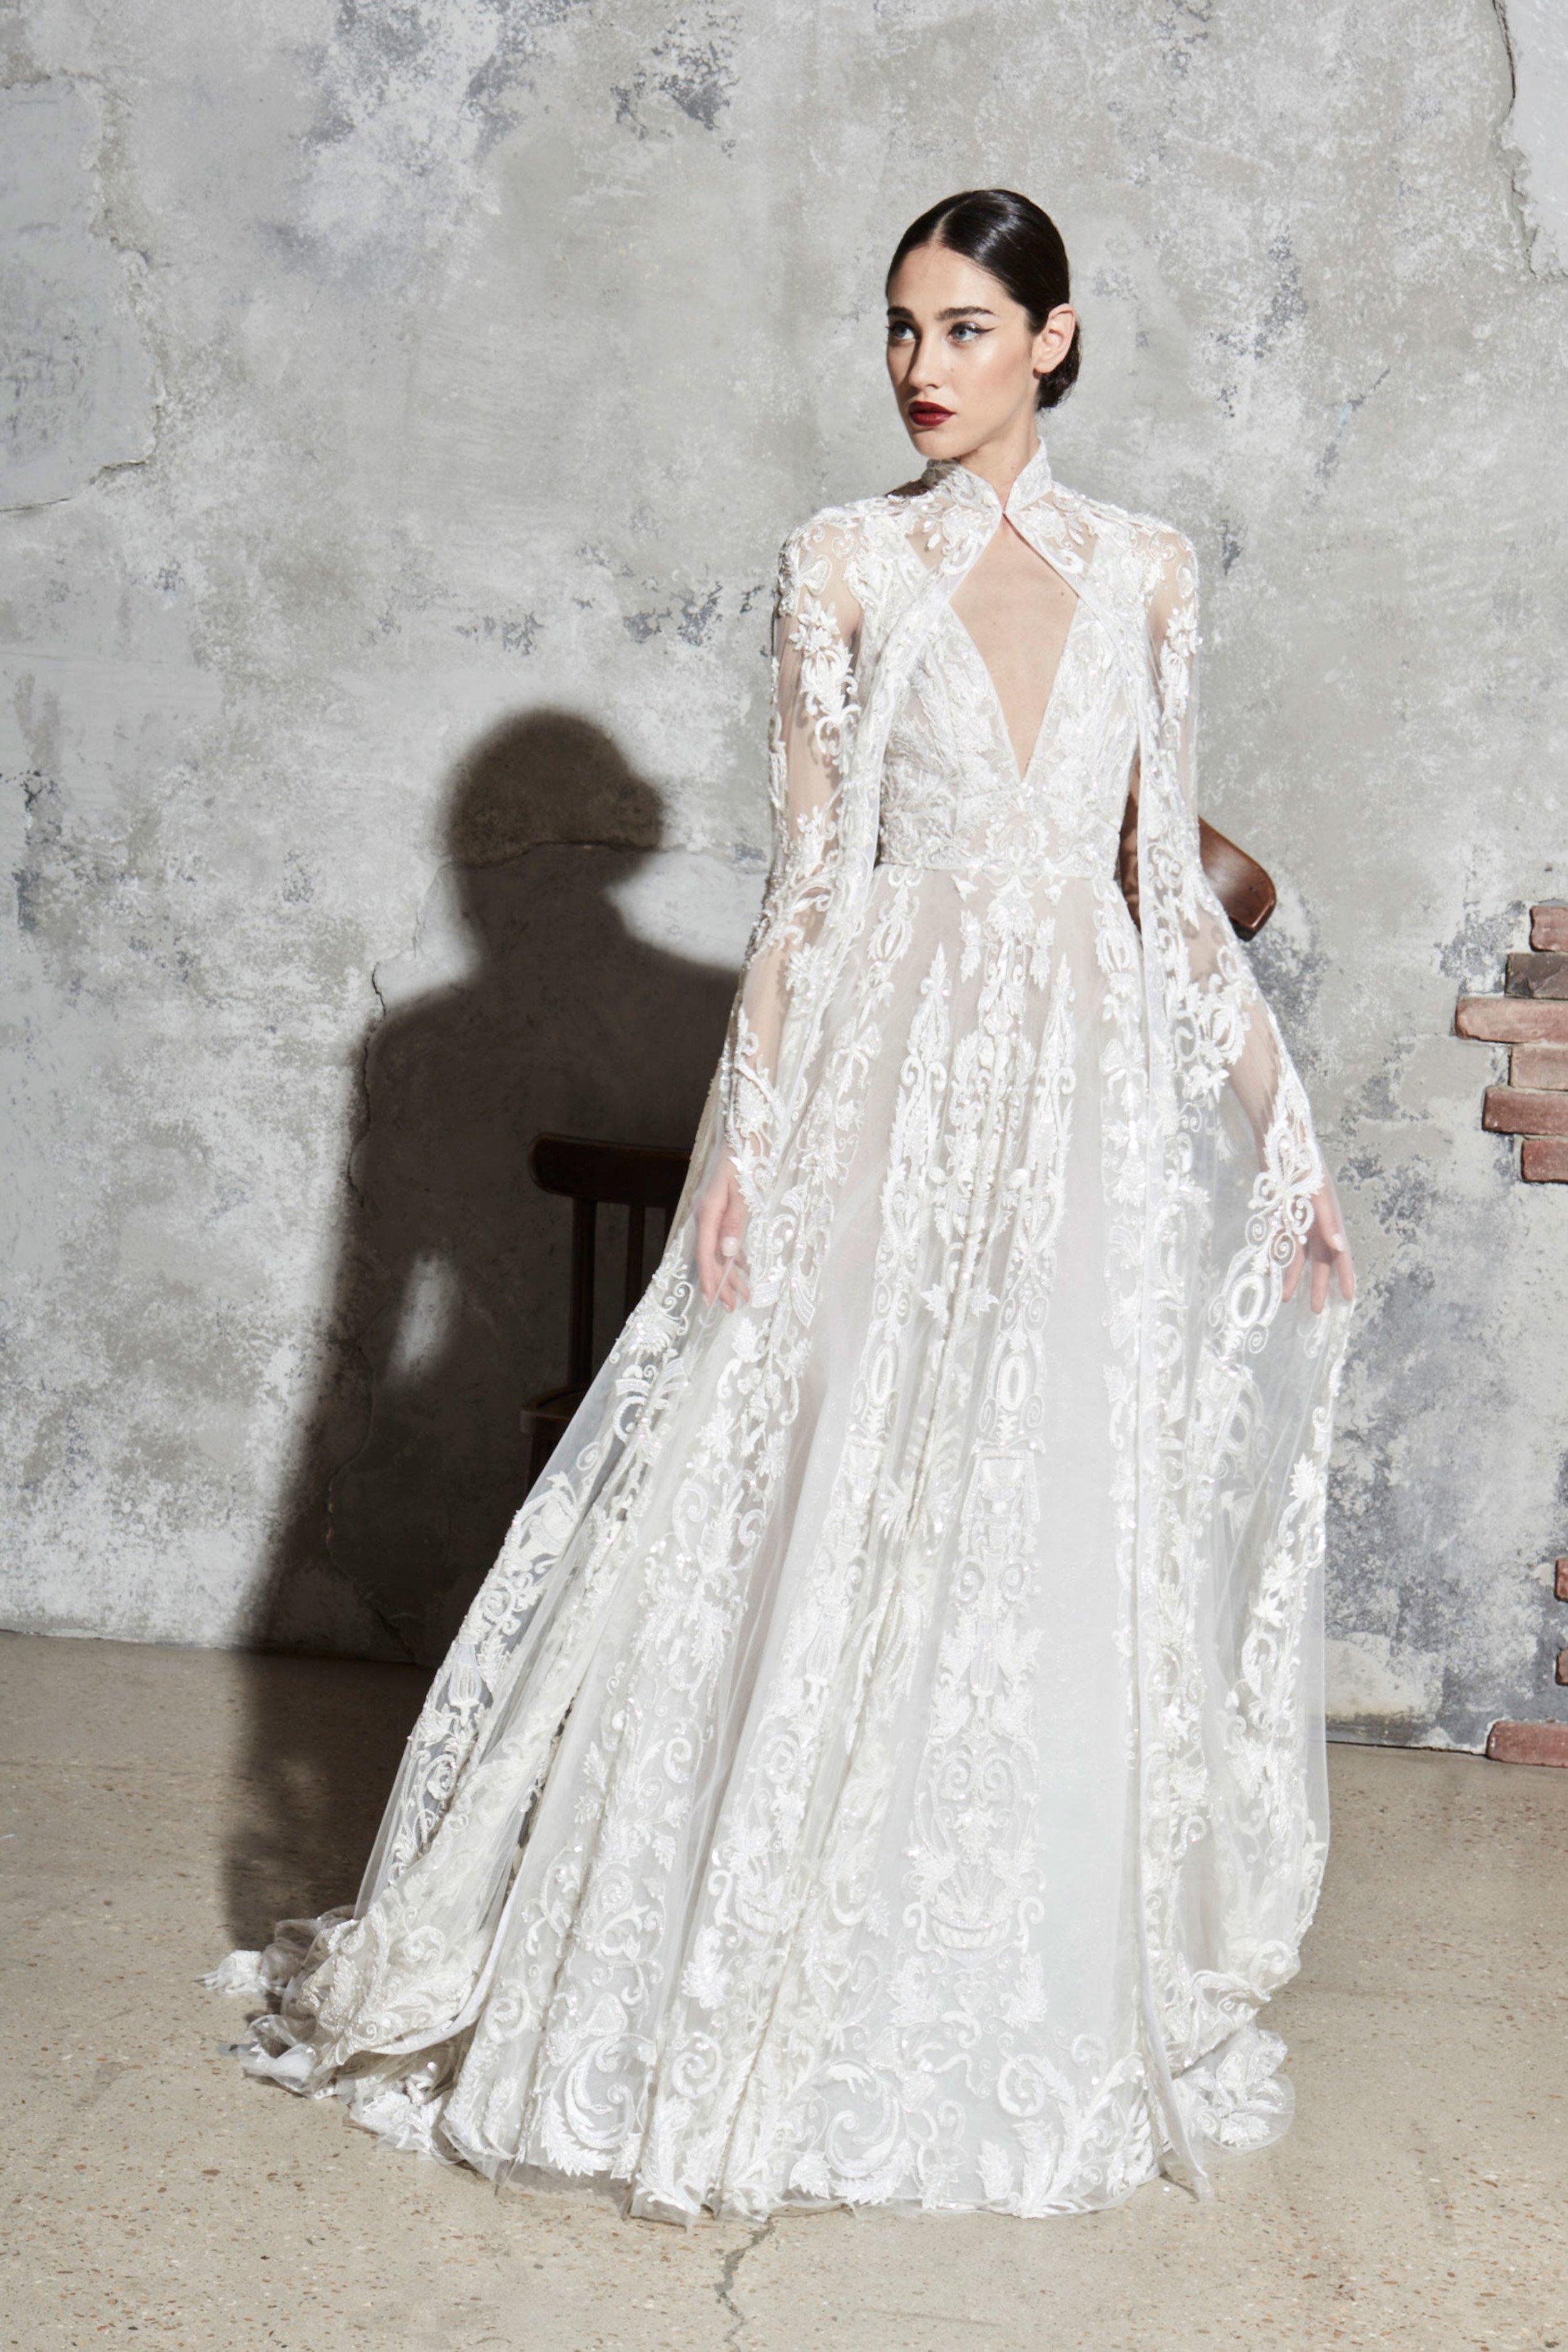 00008-zuhair-murad-new-york-bridal-Spring-2020-CREDIT-Thomas-Nutzl.jpg